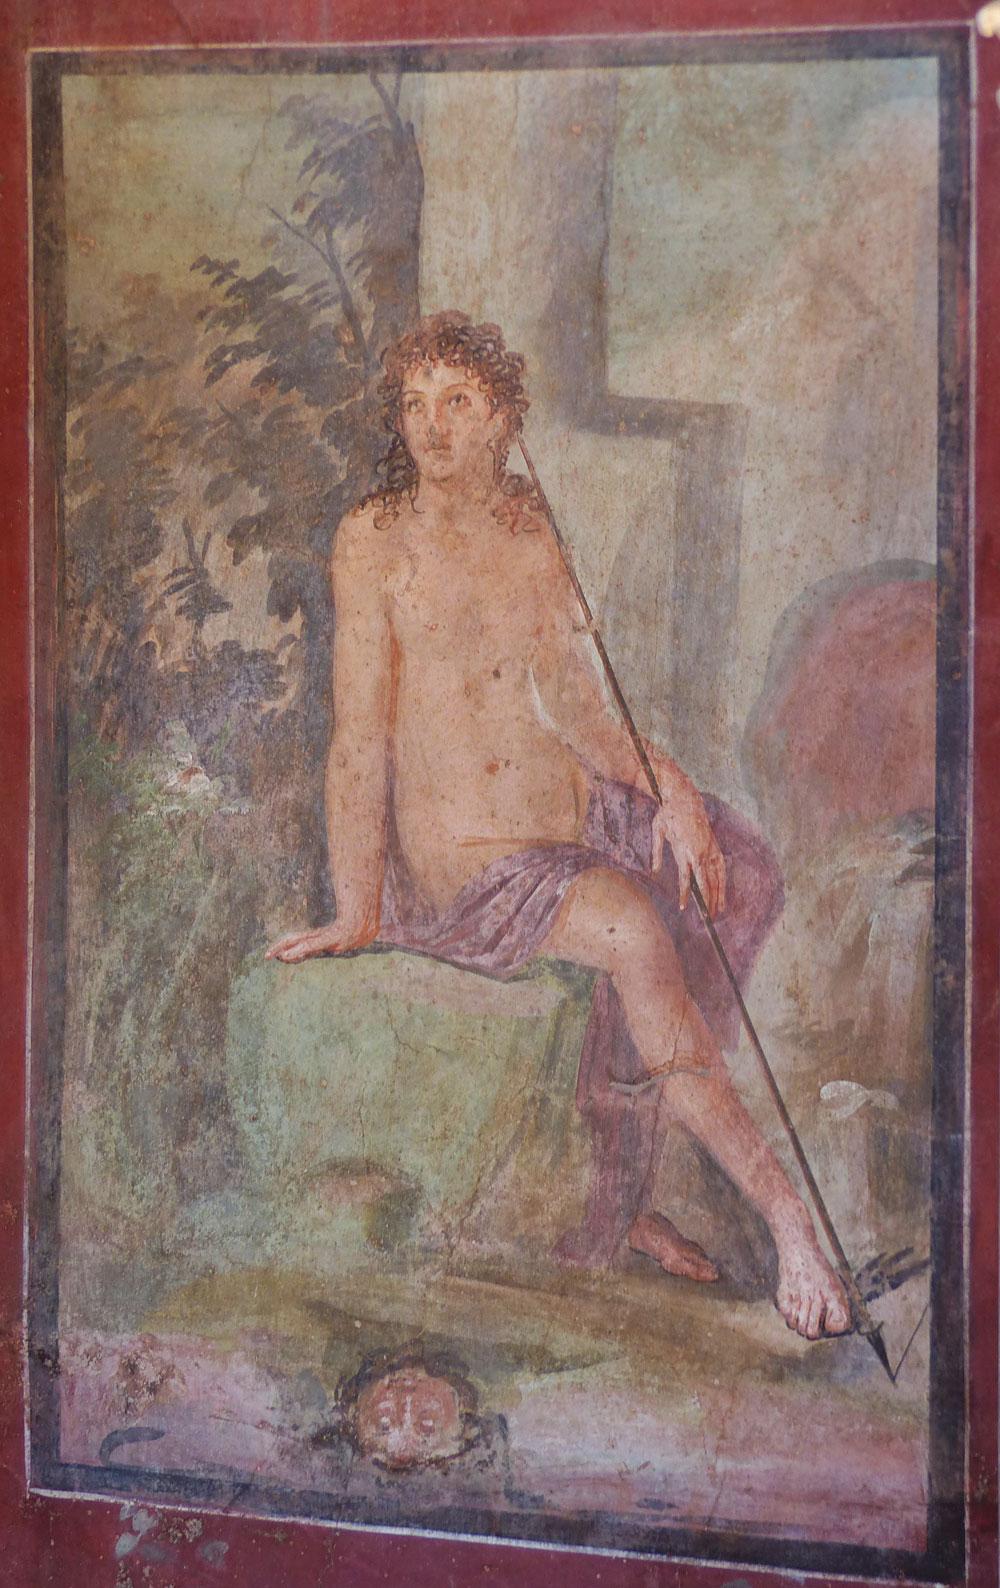 Anónimo (taller romano): Narciso (siglo I a.C.) pintura al fresco de la Casa de Ottavio Quartione de Pompeya, Museo Arqueológico Nacional de Nápoles.